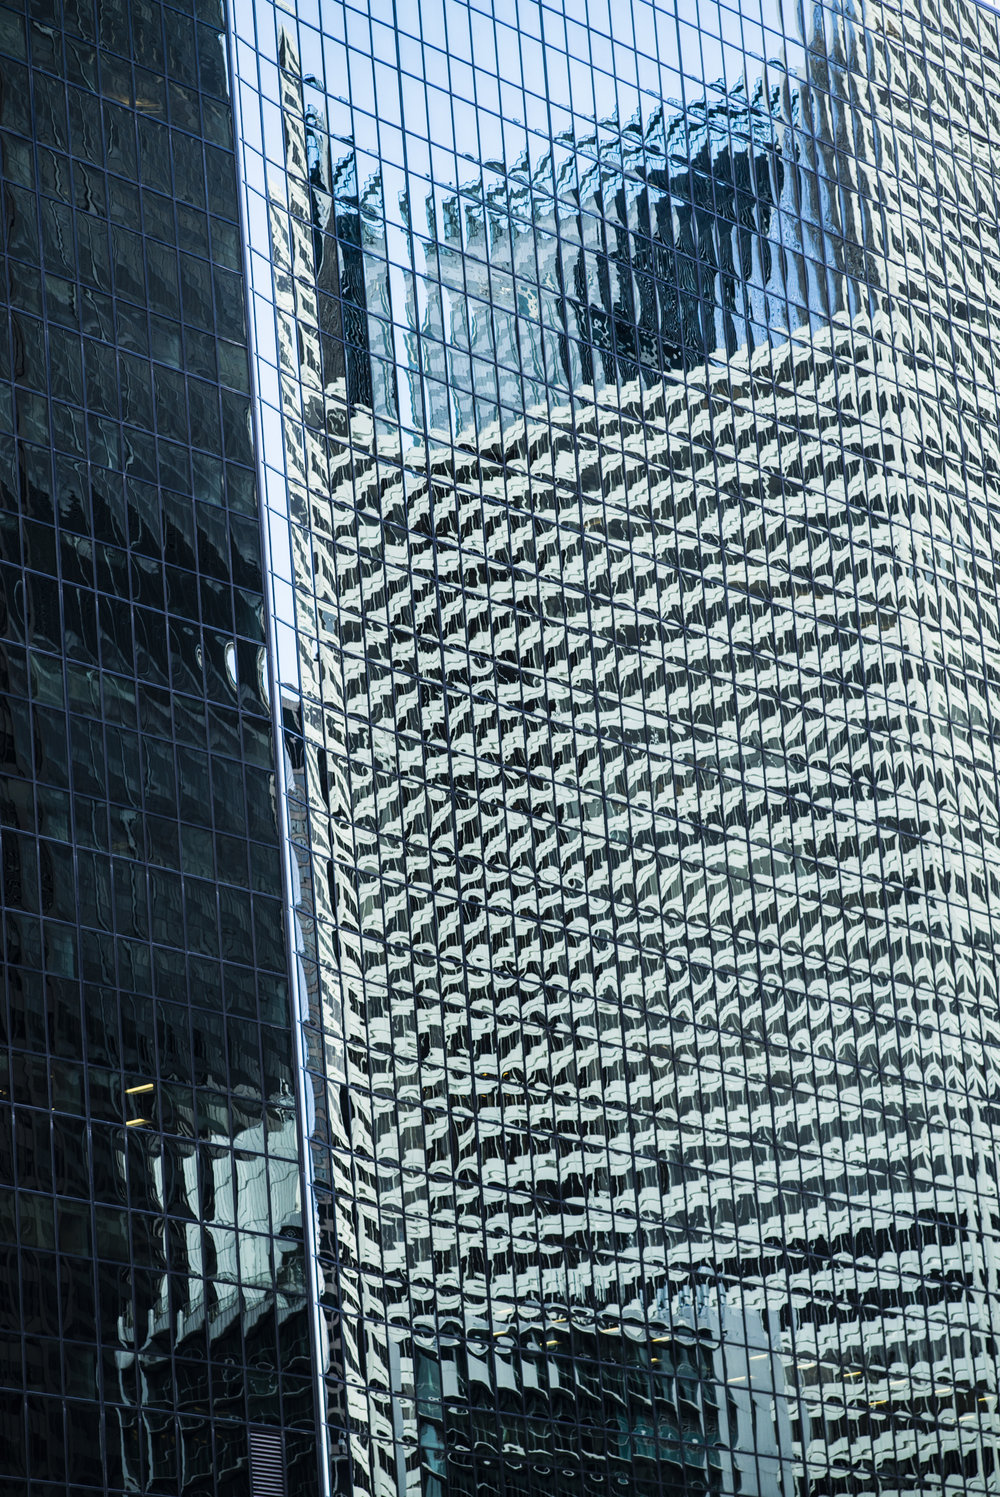 Architecture-L1000571.jpg